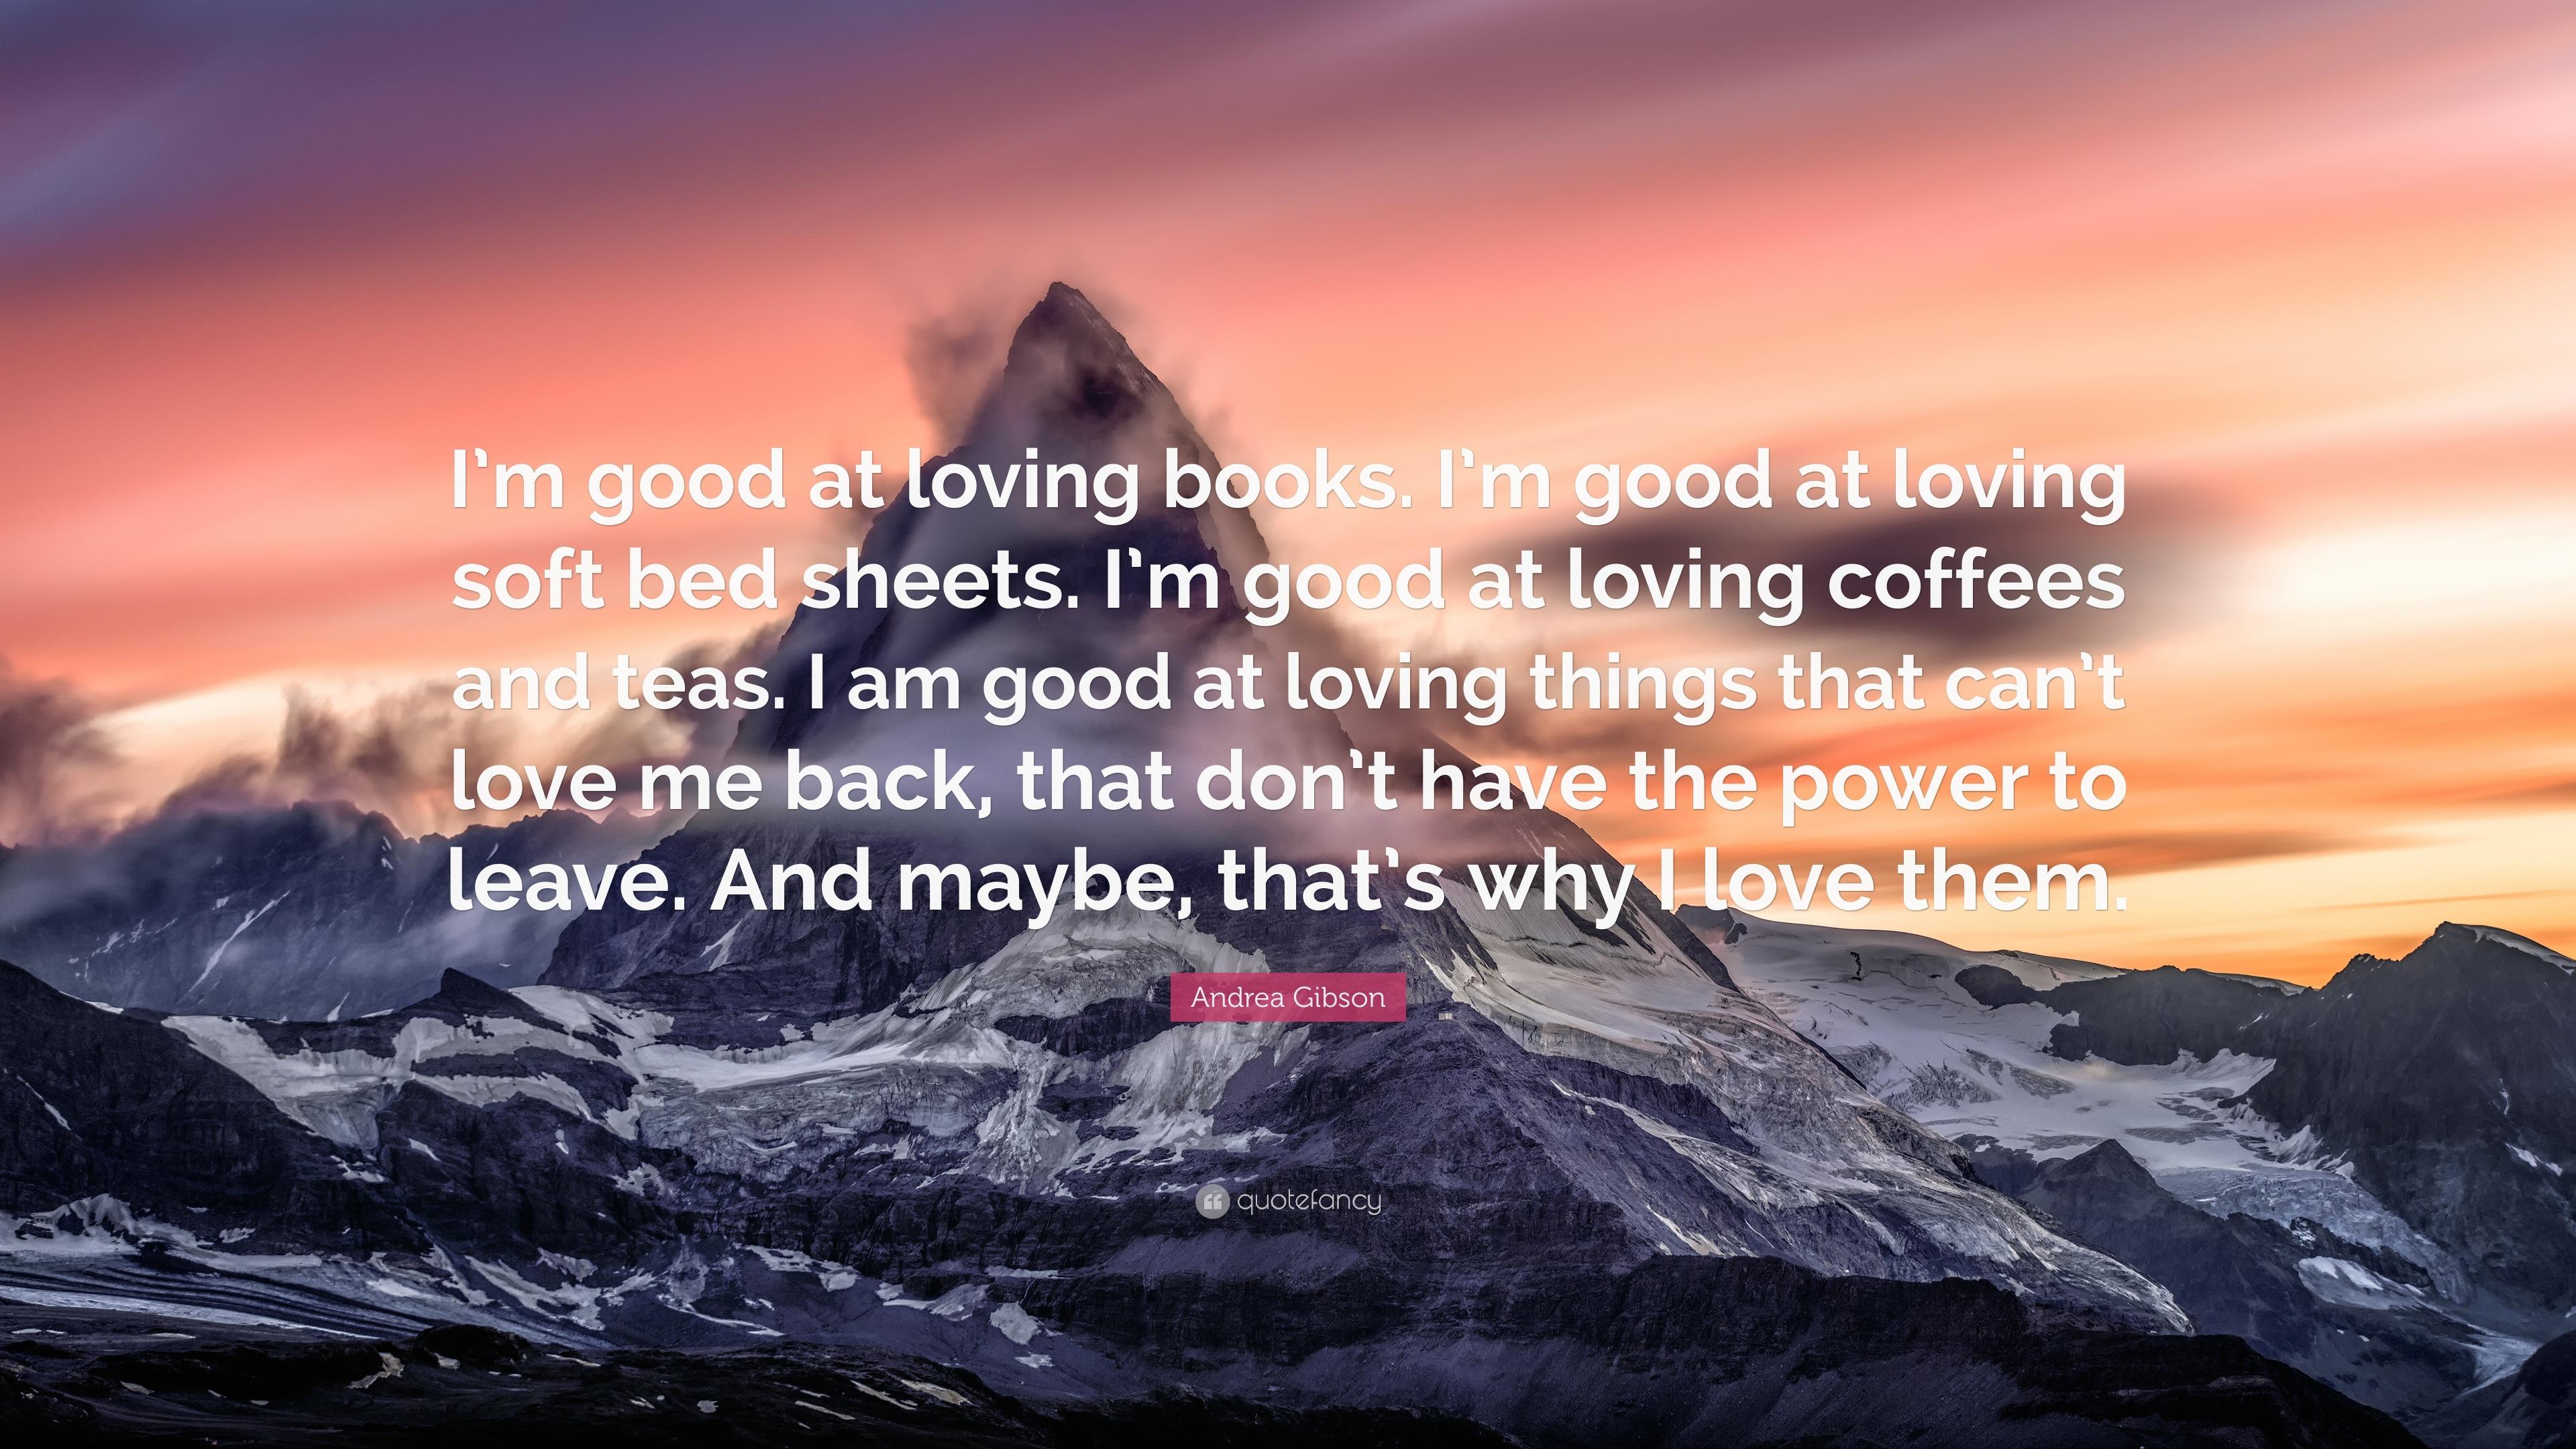 Andrea Gibson Quote: U201cIu0027m Good At Loving Books. Iu0027m